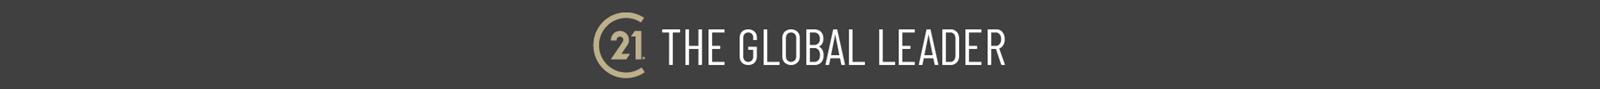 THE-GLOBAL-LEADER